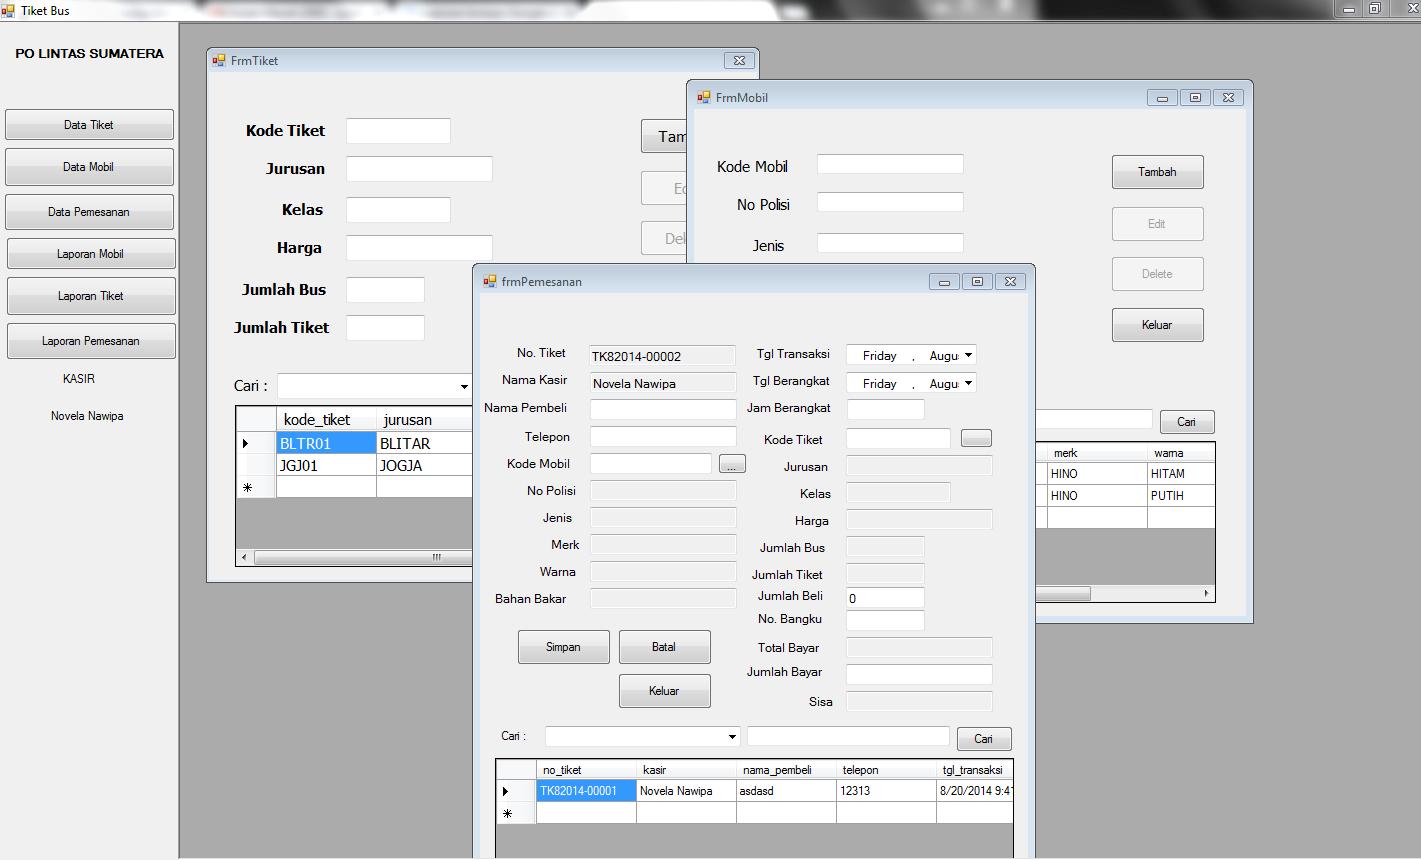 Aplikasi Penjualan Tiket Bus Visual Basic 2010 - Ilmu Programmer